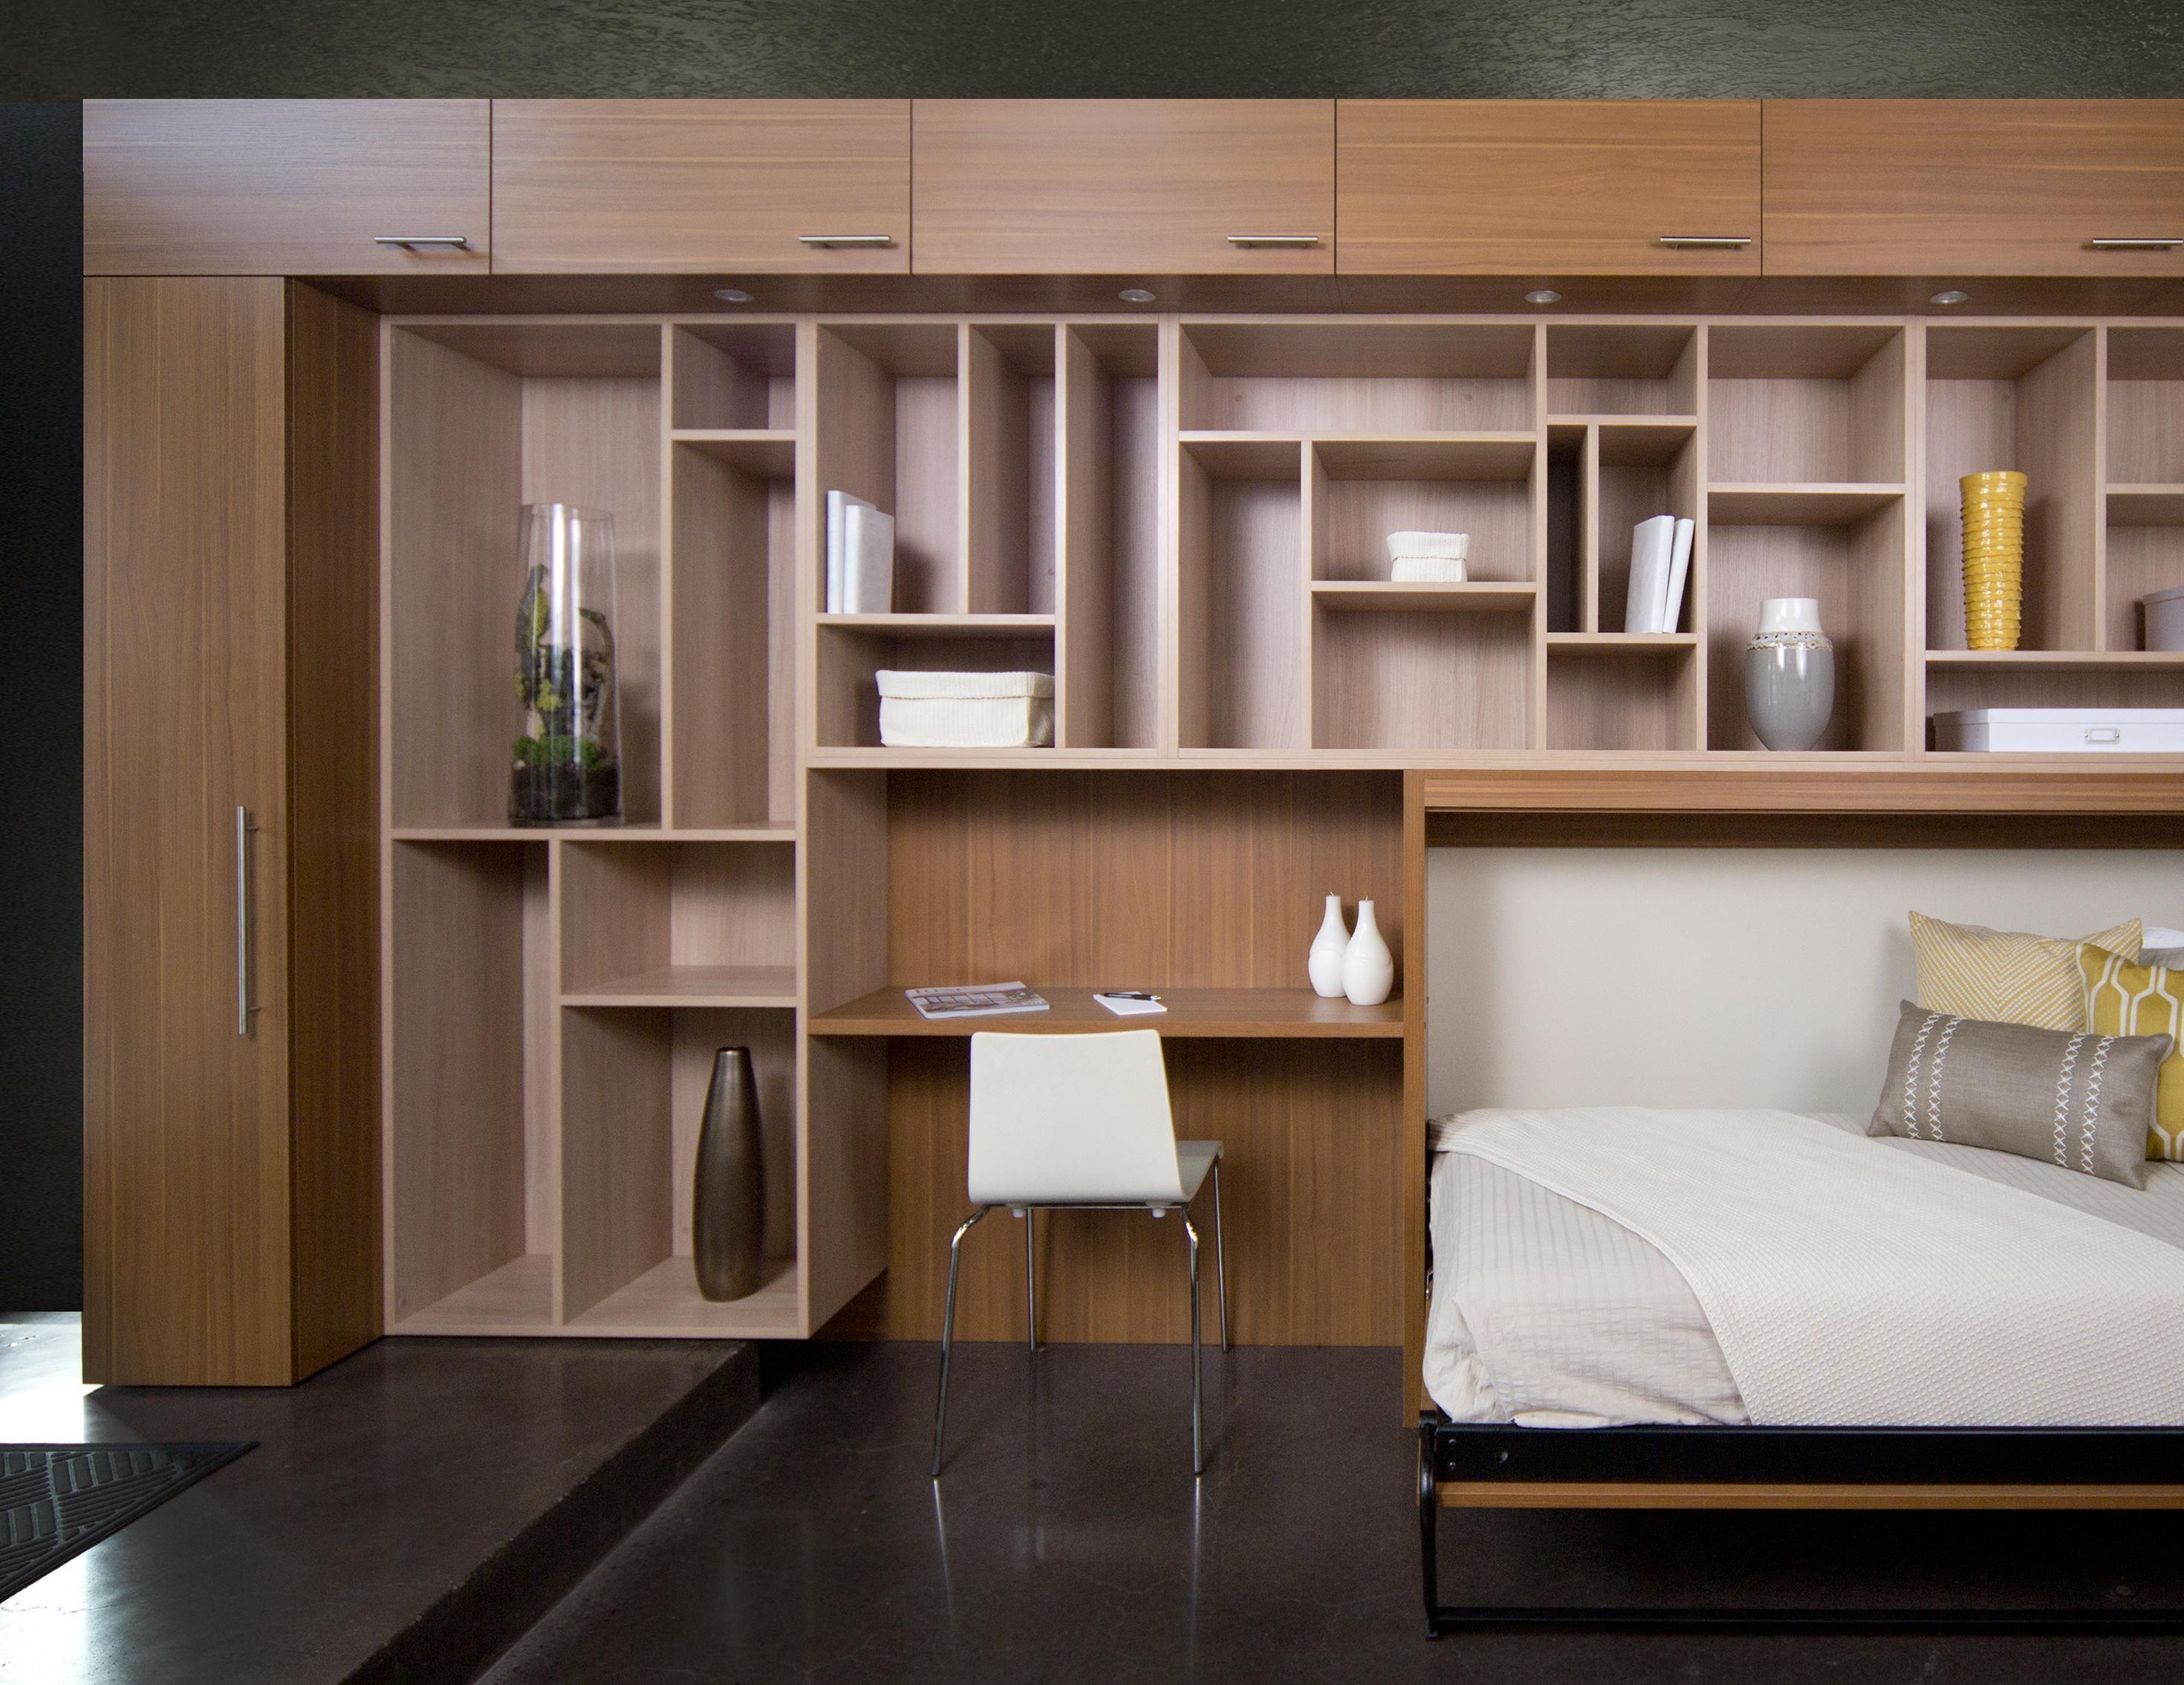 Modern Wall Beds Custom Built Wall Beds By California Closets California Closets Bed Wall Wall Bed Designs